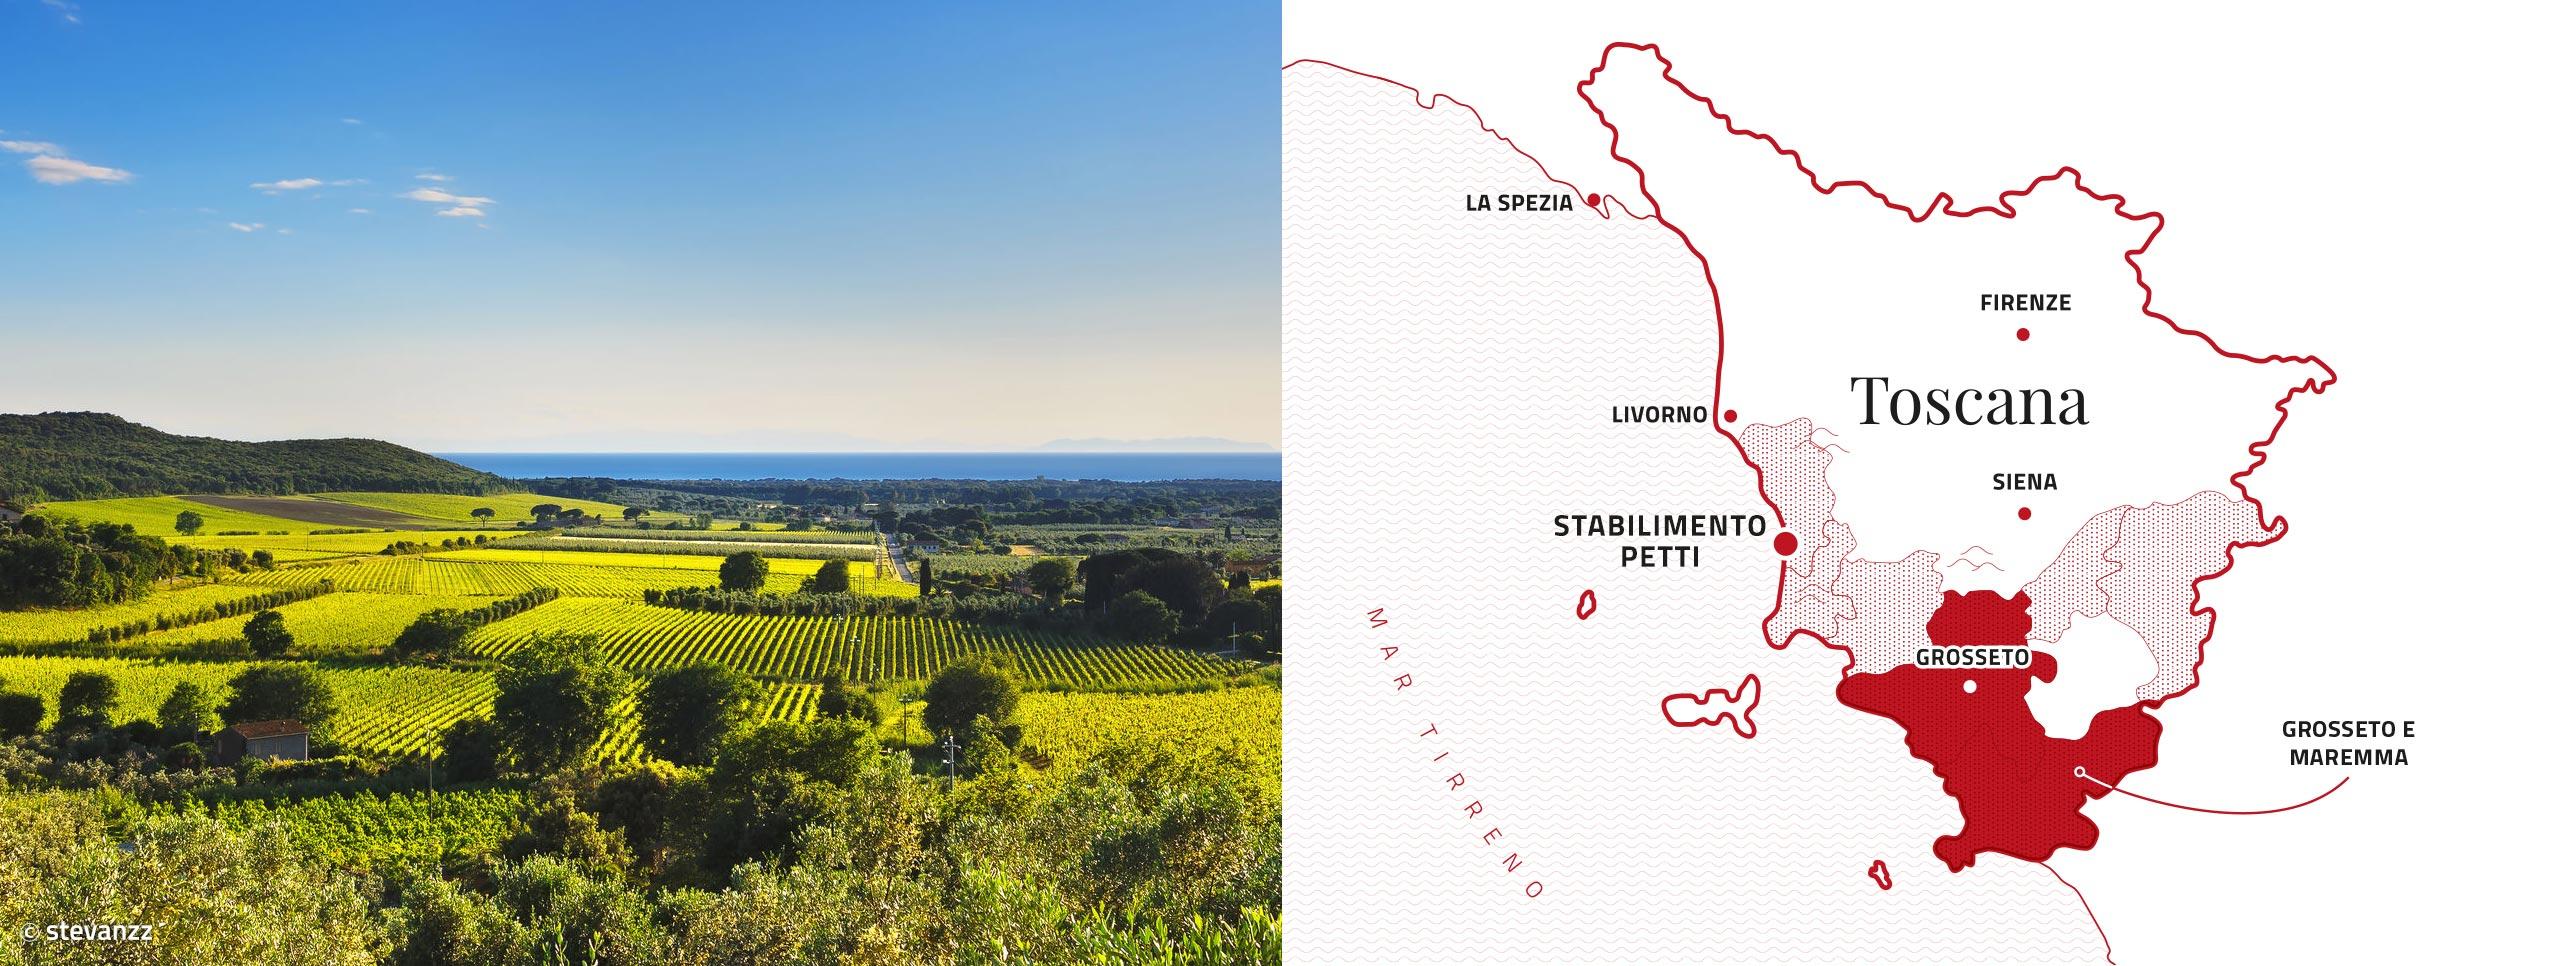 Mappa stabilimenti Petti Maremma